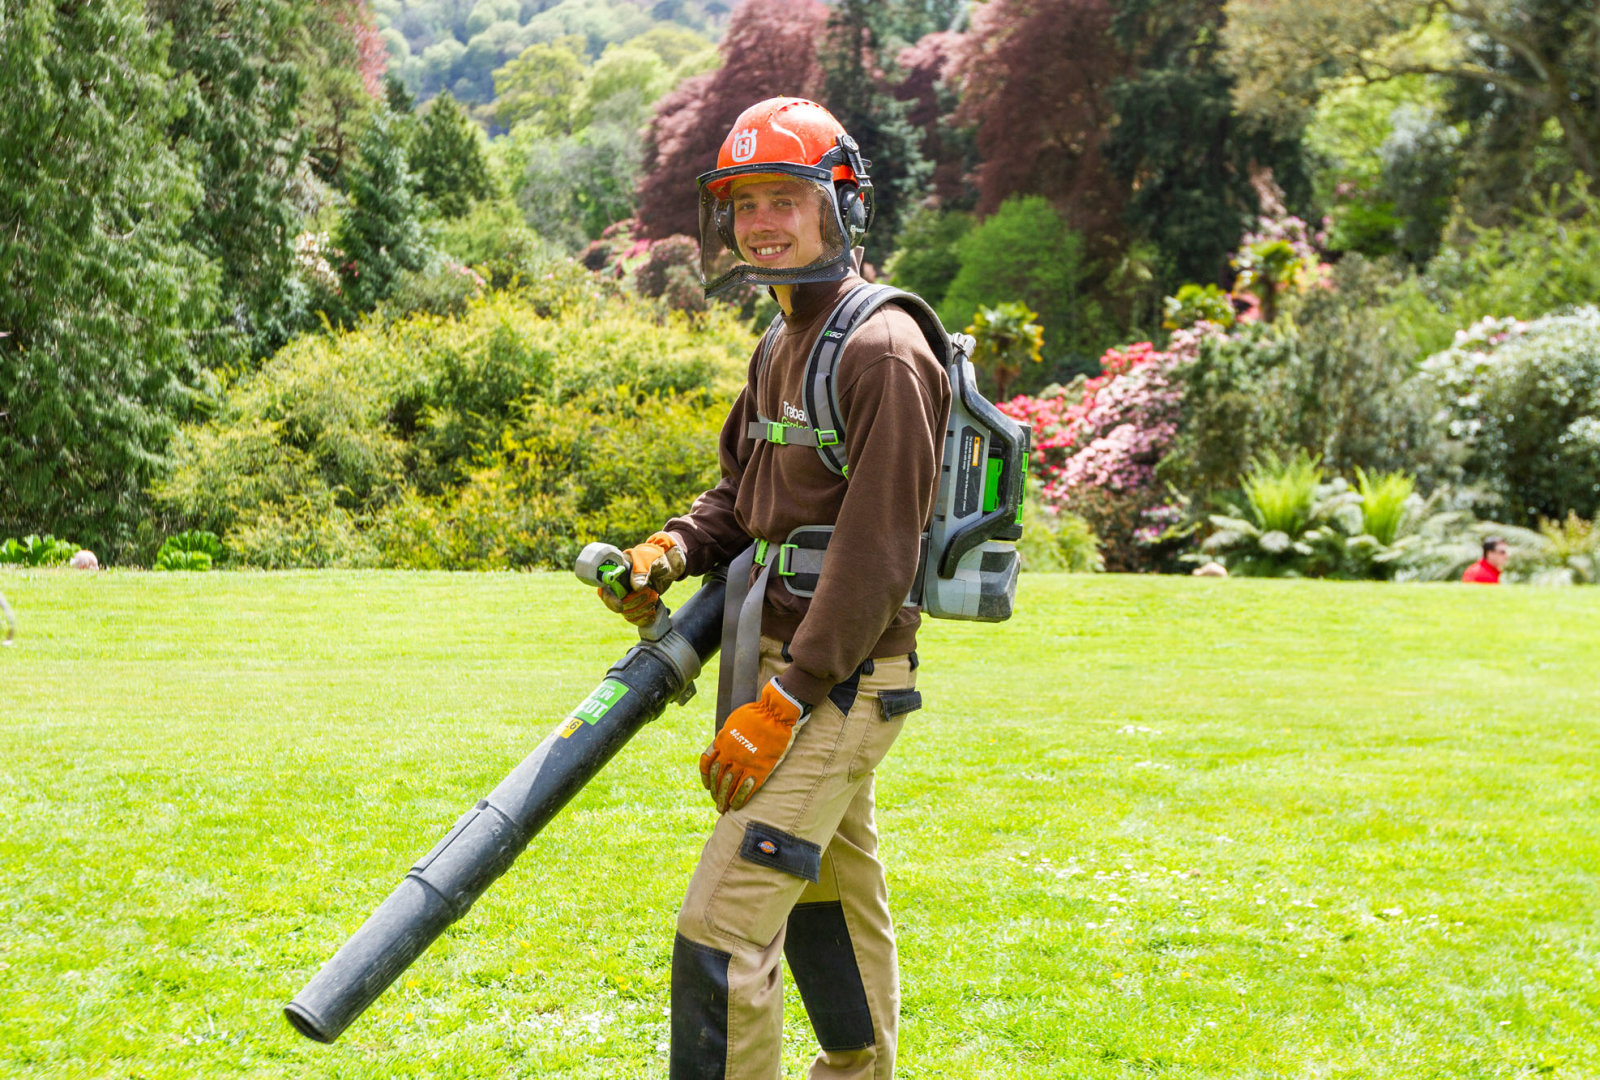 Gardener with electric leaf blower